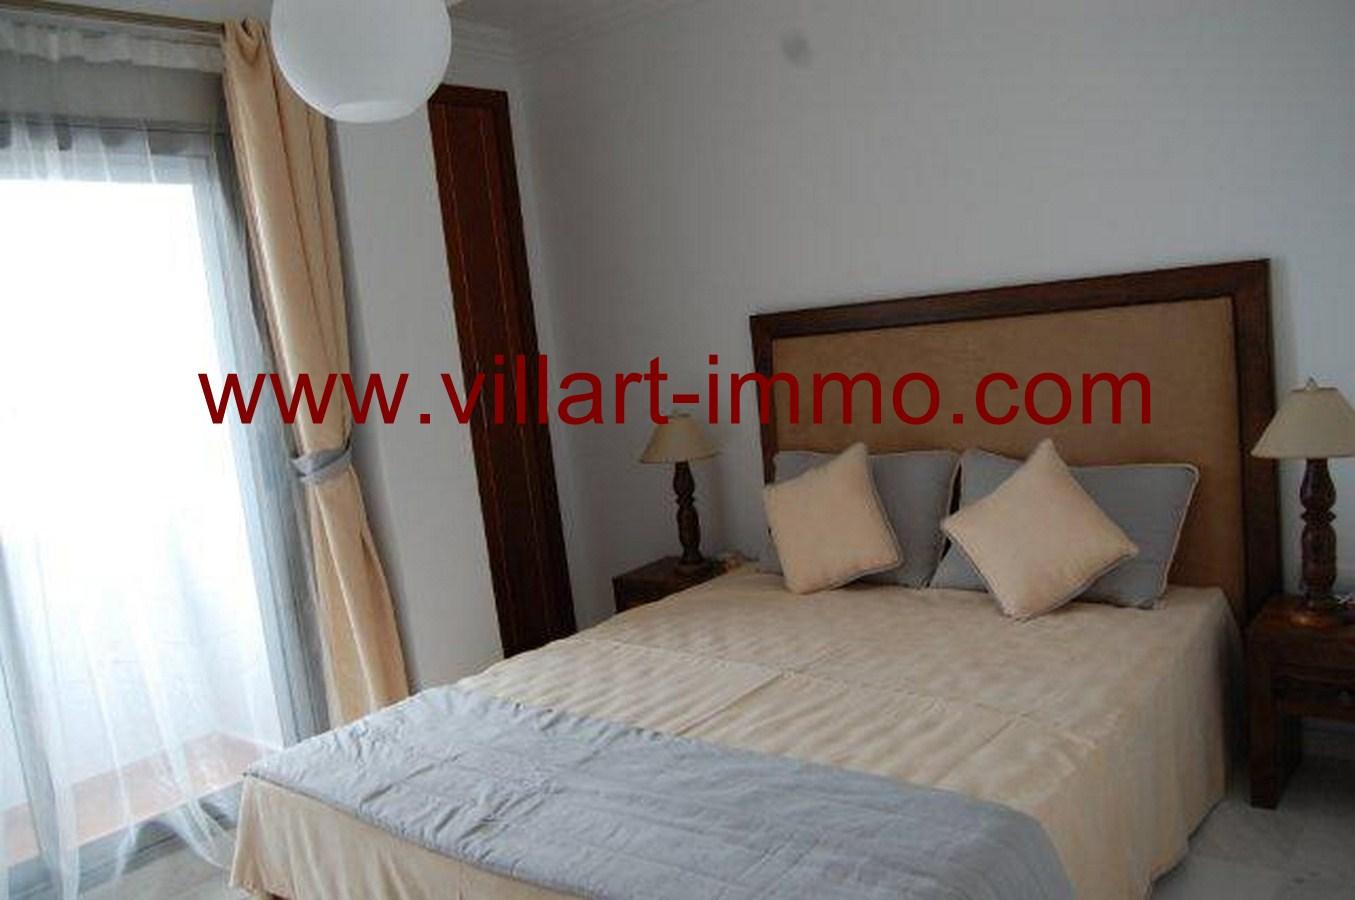 3-Appart-Meublé-Chambre1-Tanger-Agence-Location-Villartimmo